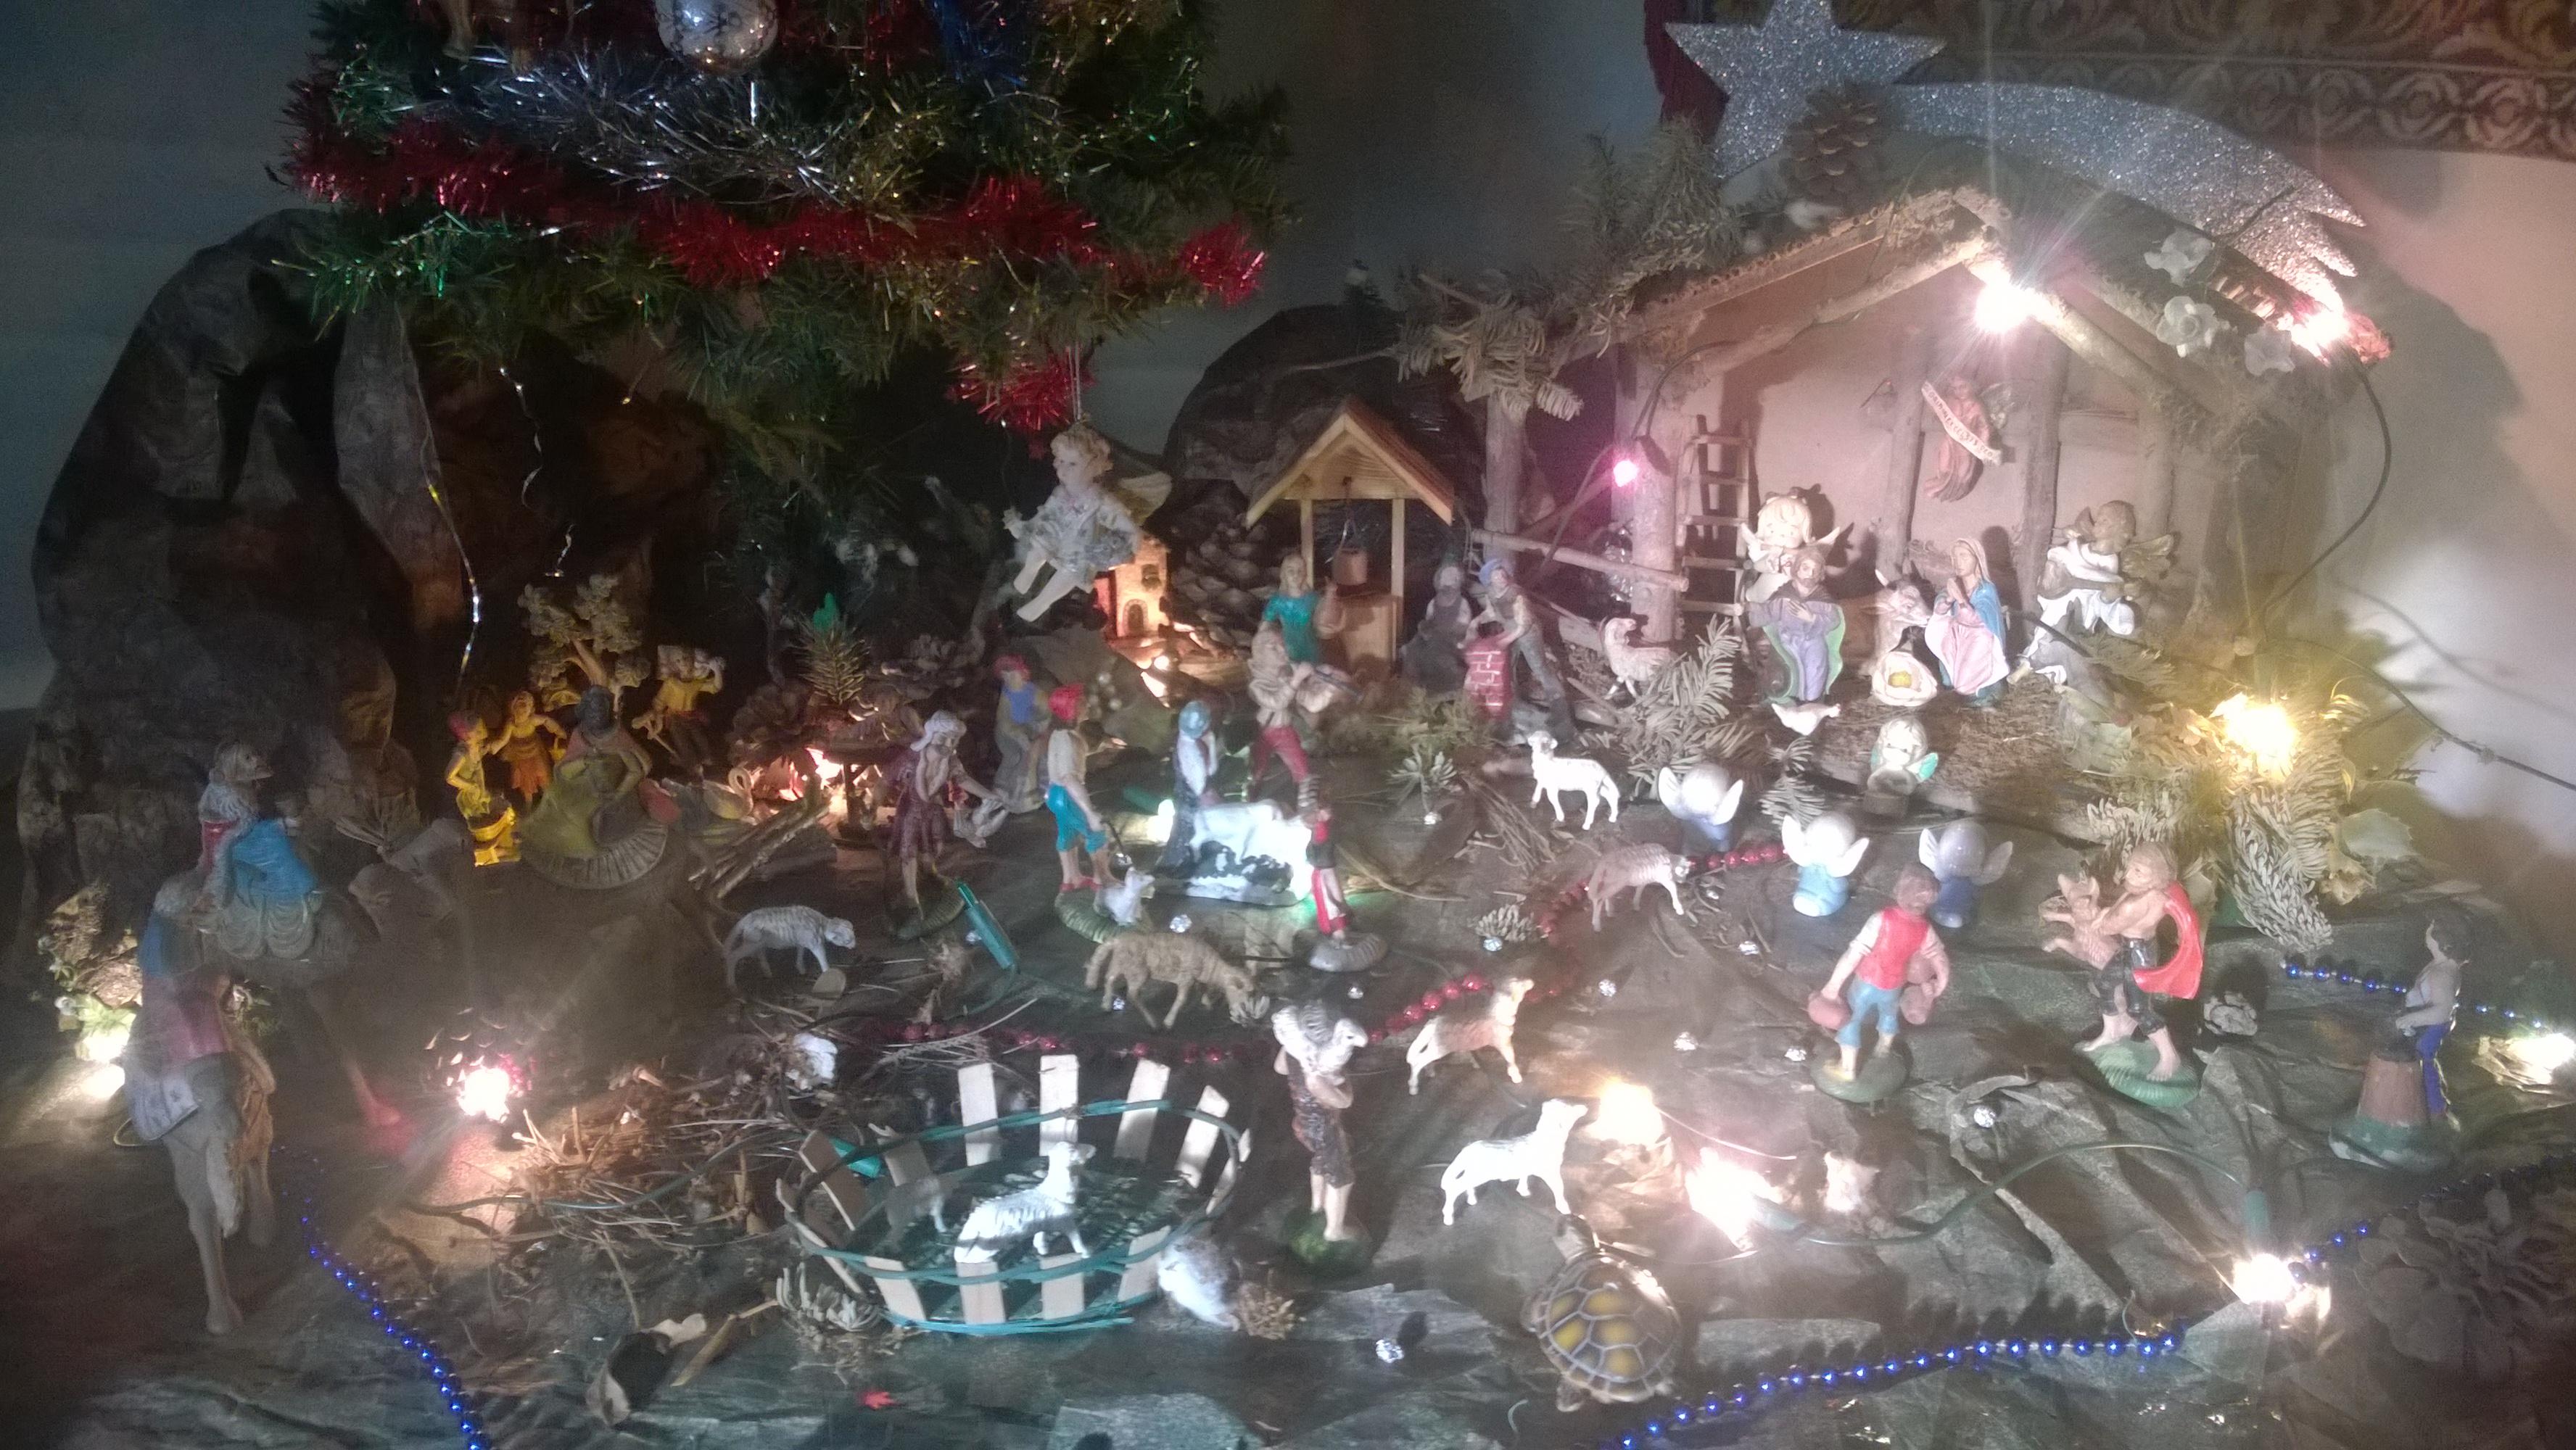 manger scene, Christmas creche, Christmas crib, presepio